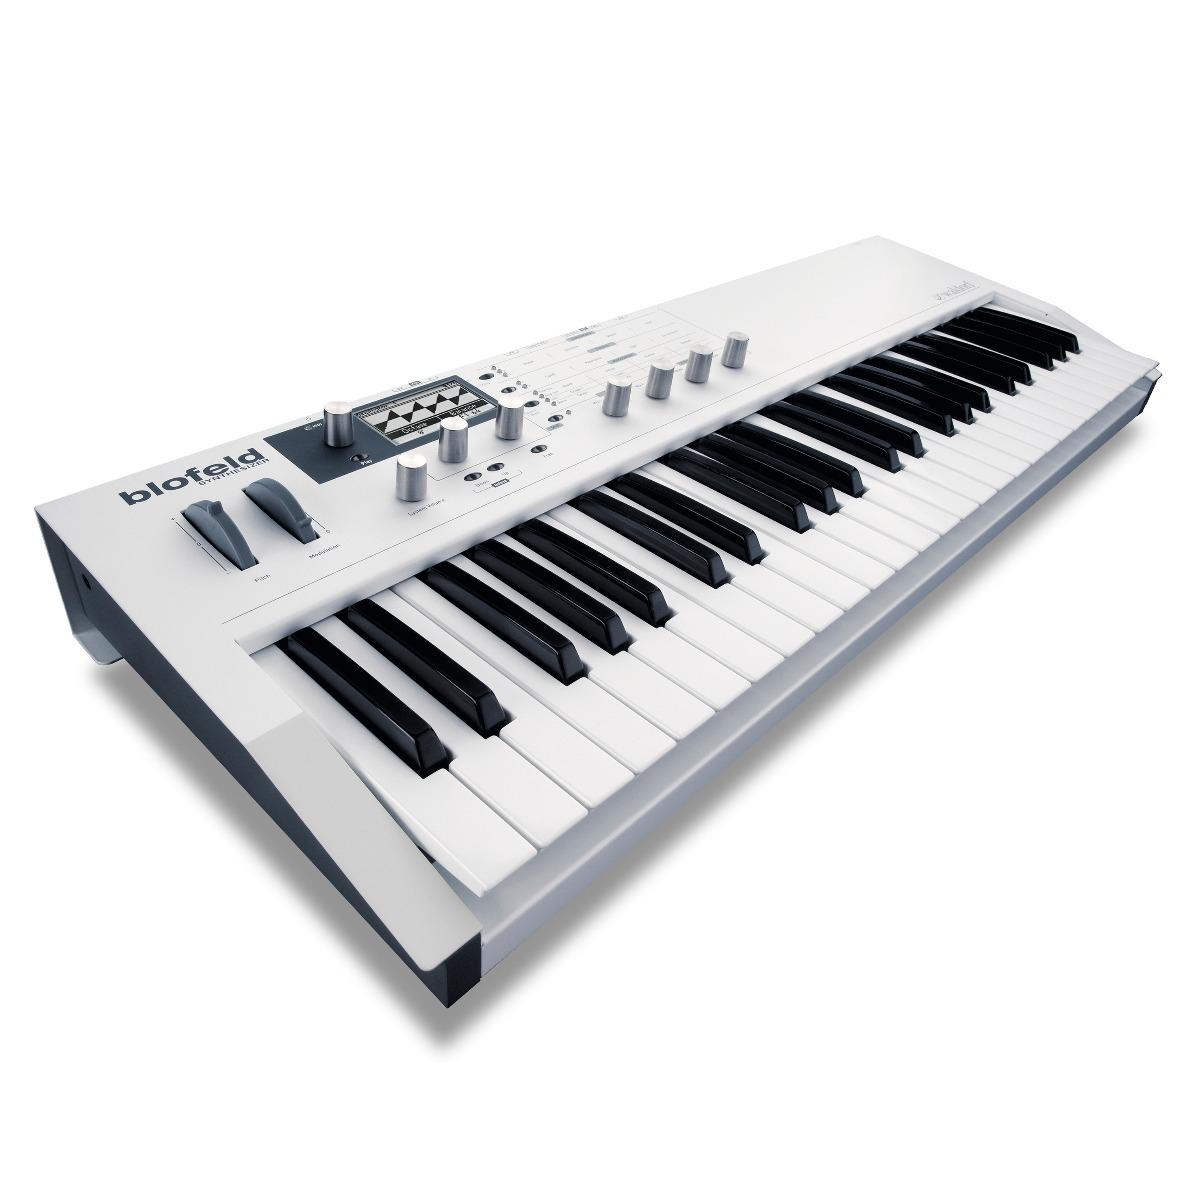 Waldorf Blofeld Keyboard white 226178